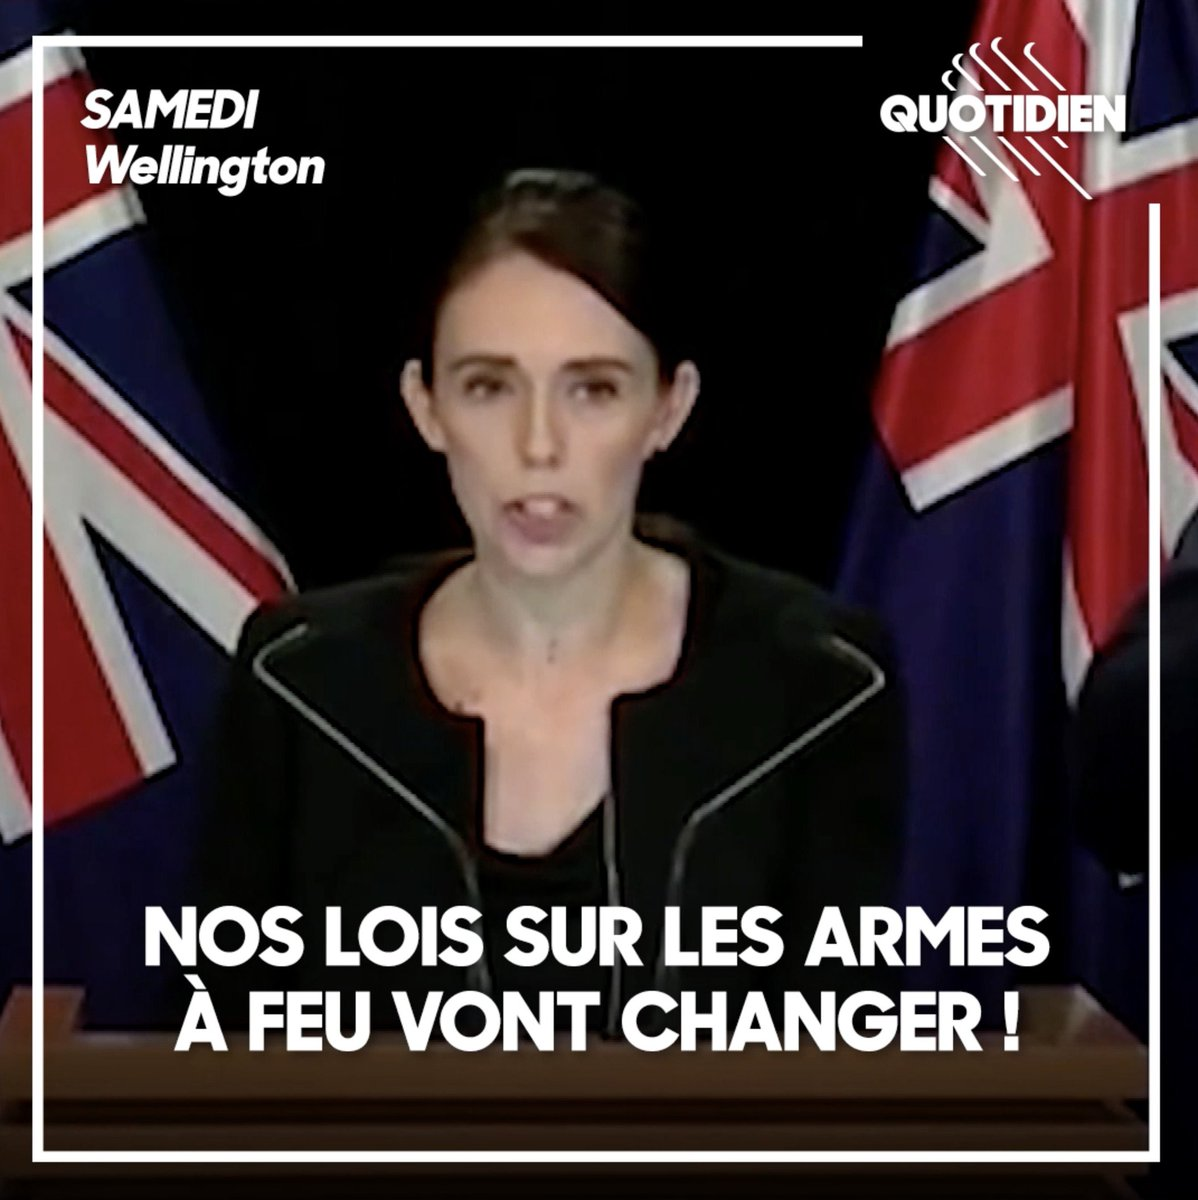 Quotidien's photo on Christchurch